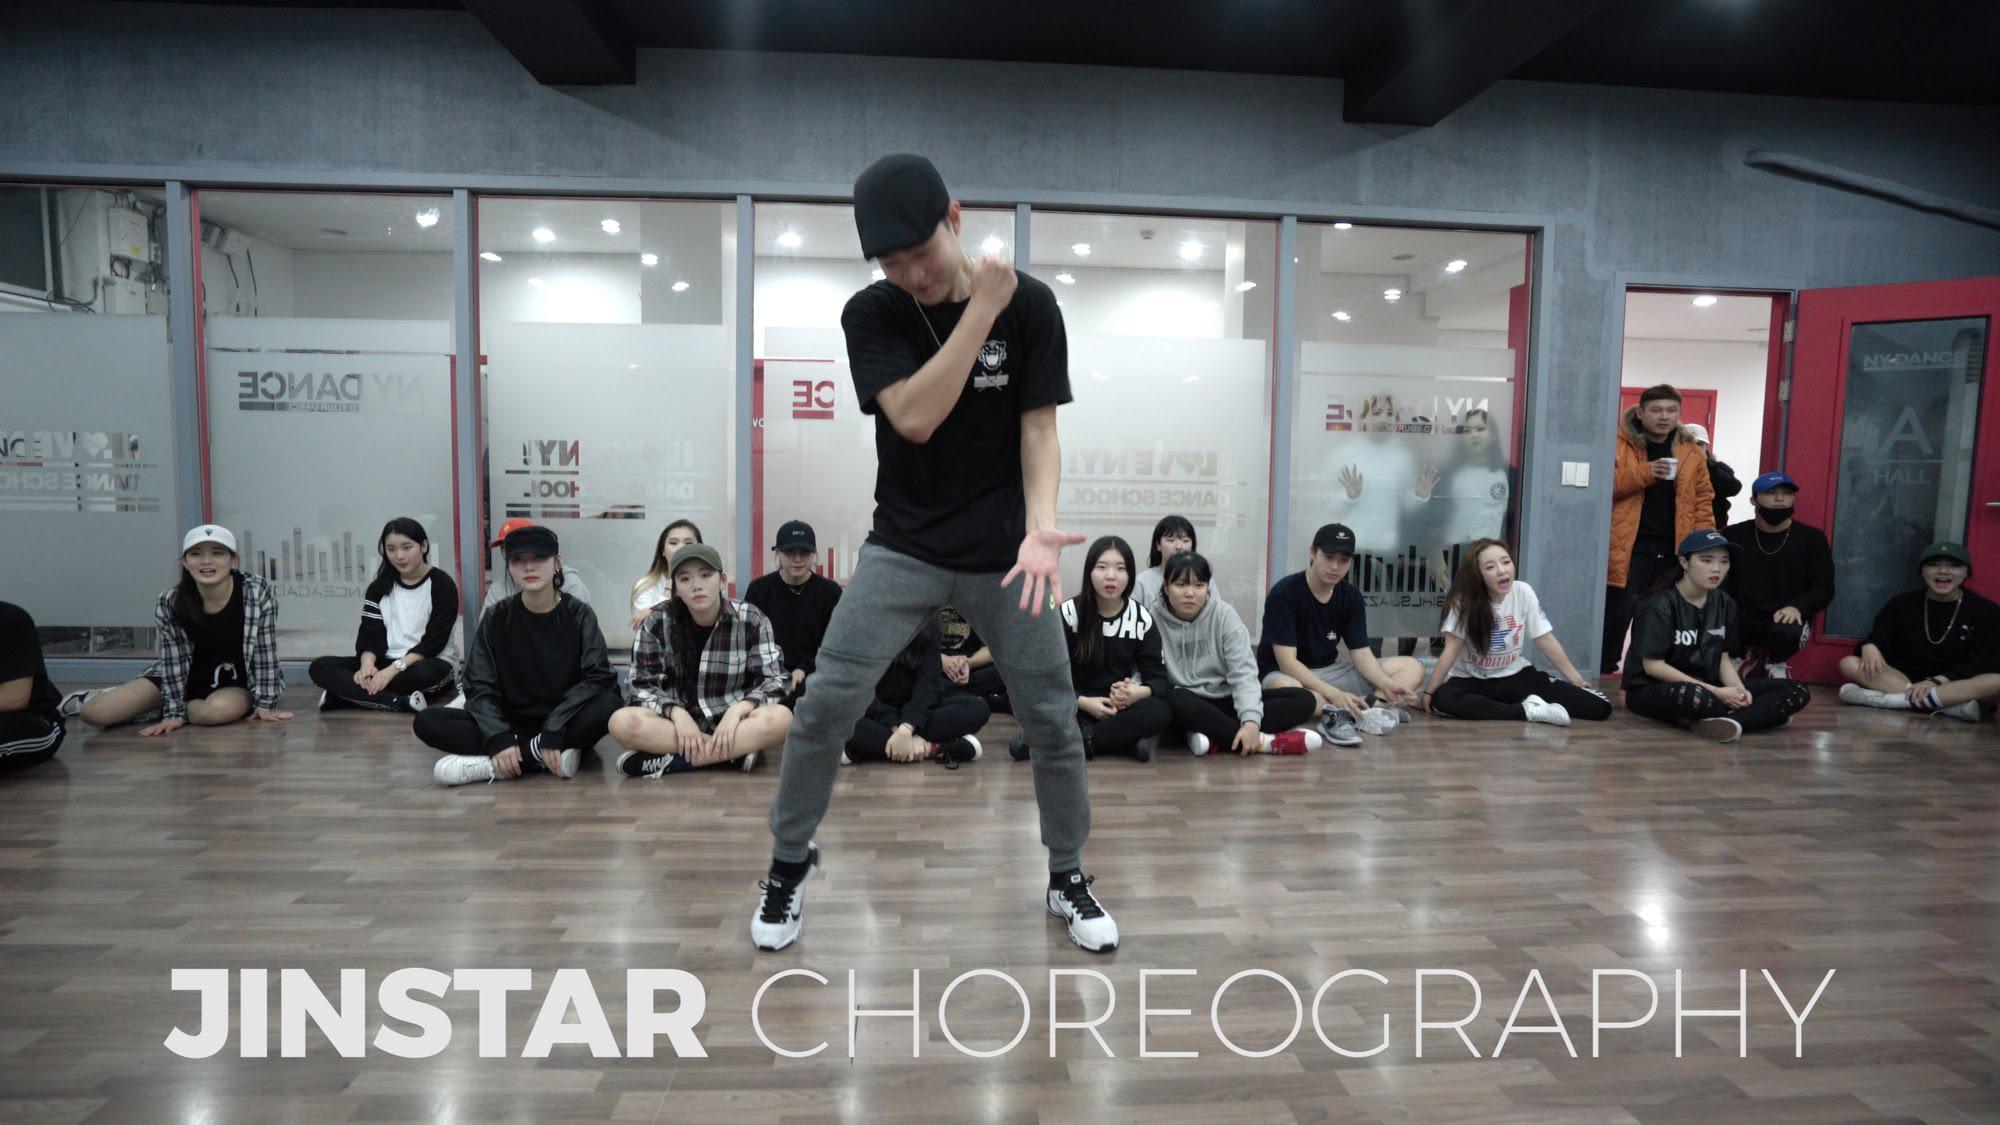 Charlie Puth – Suffer (Choreo. Jinstar)